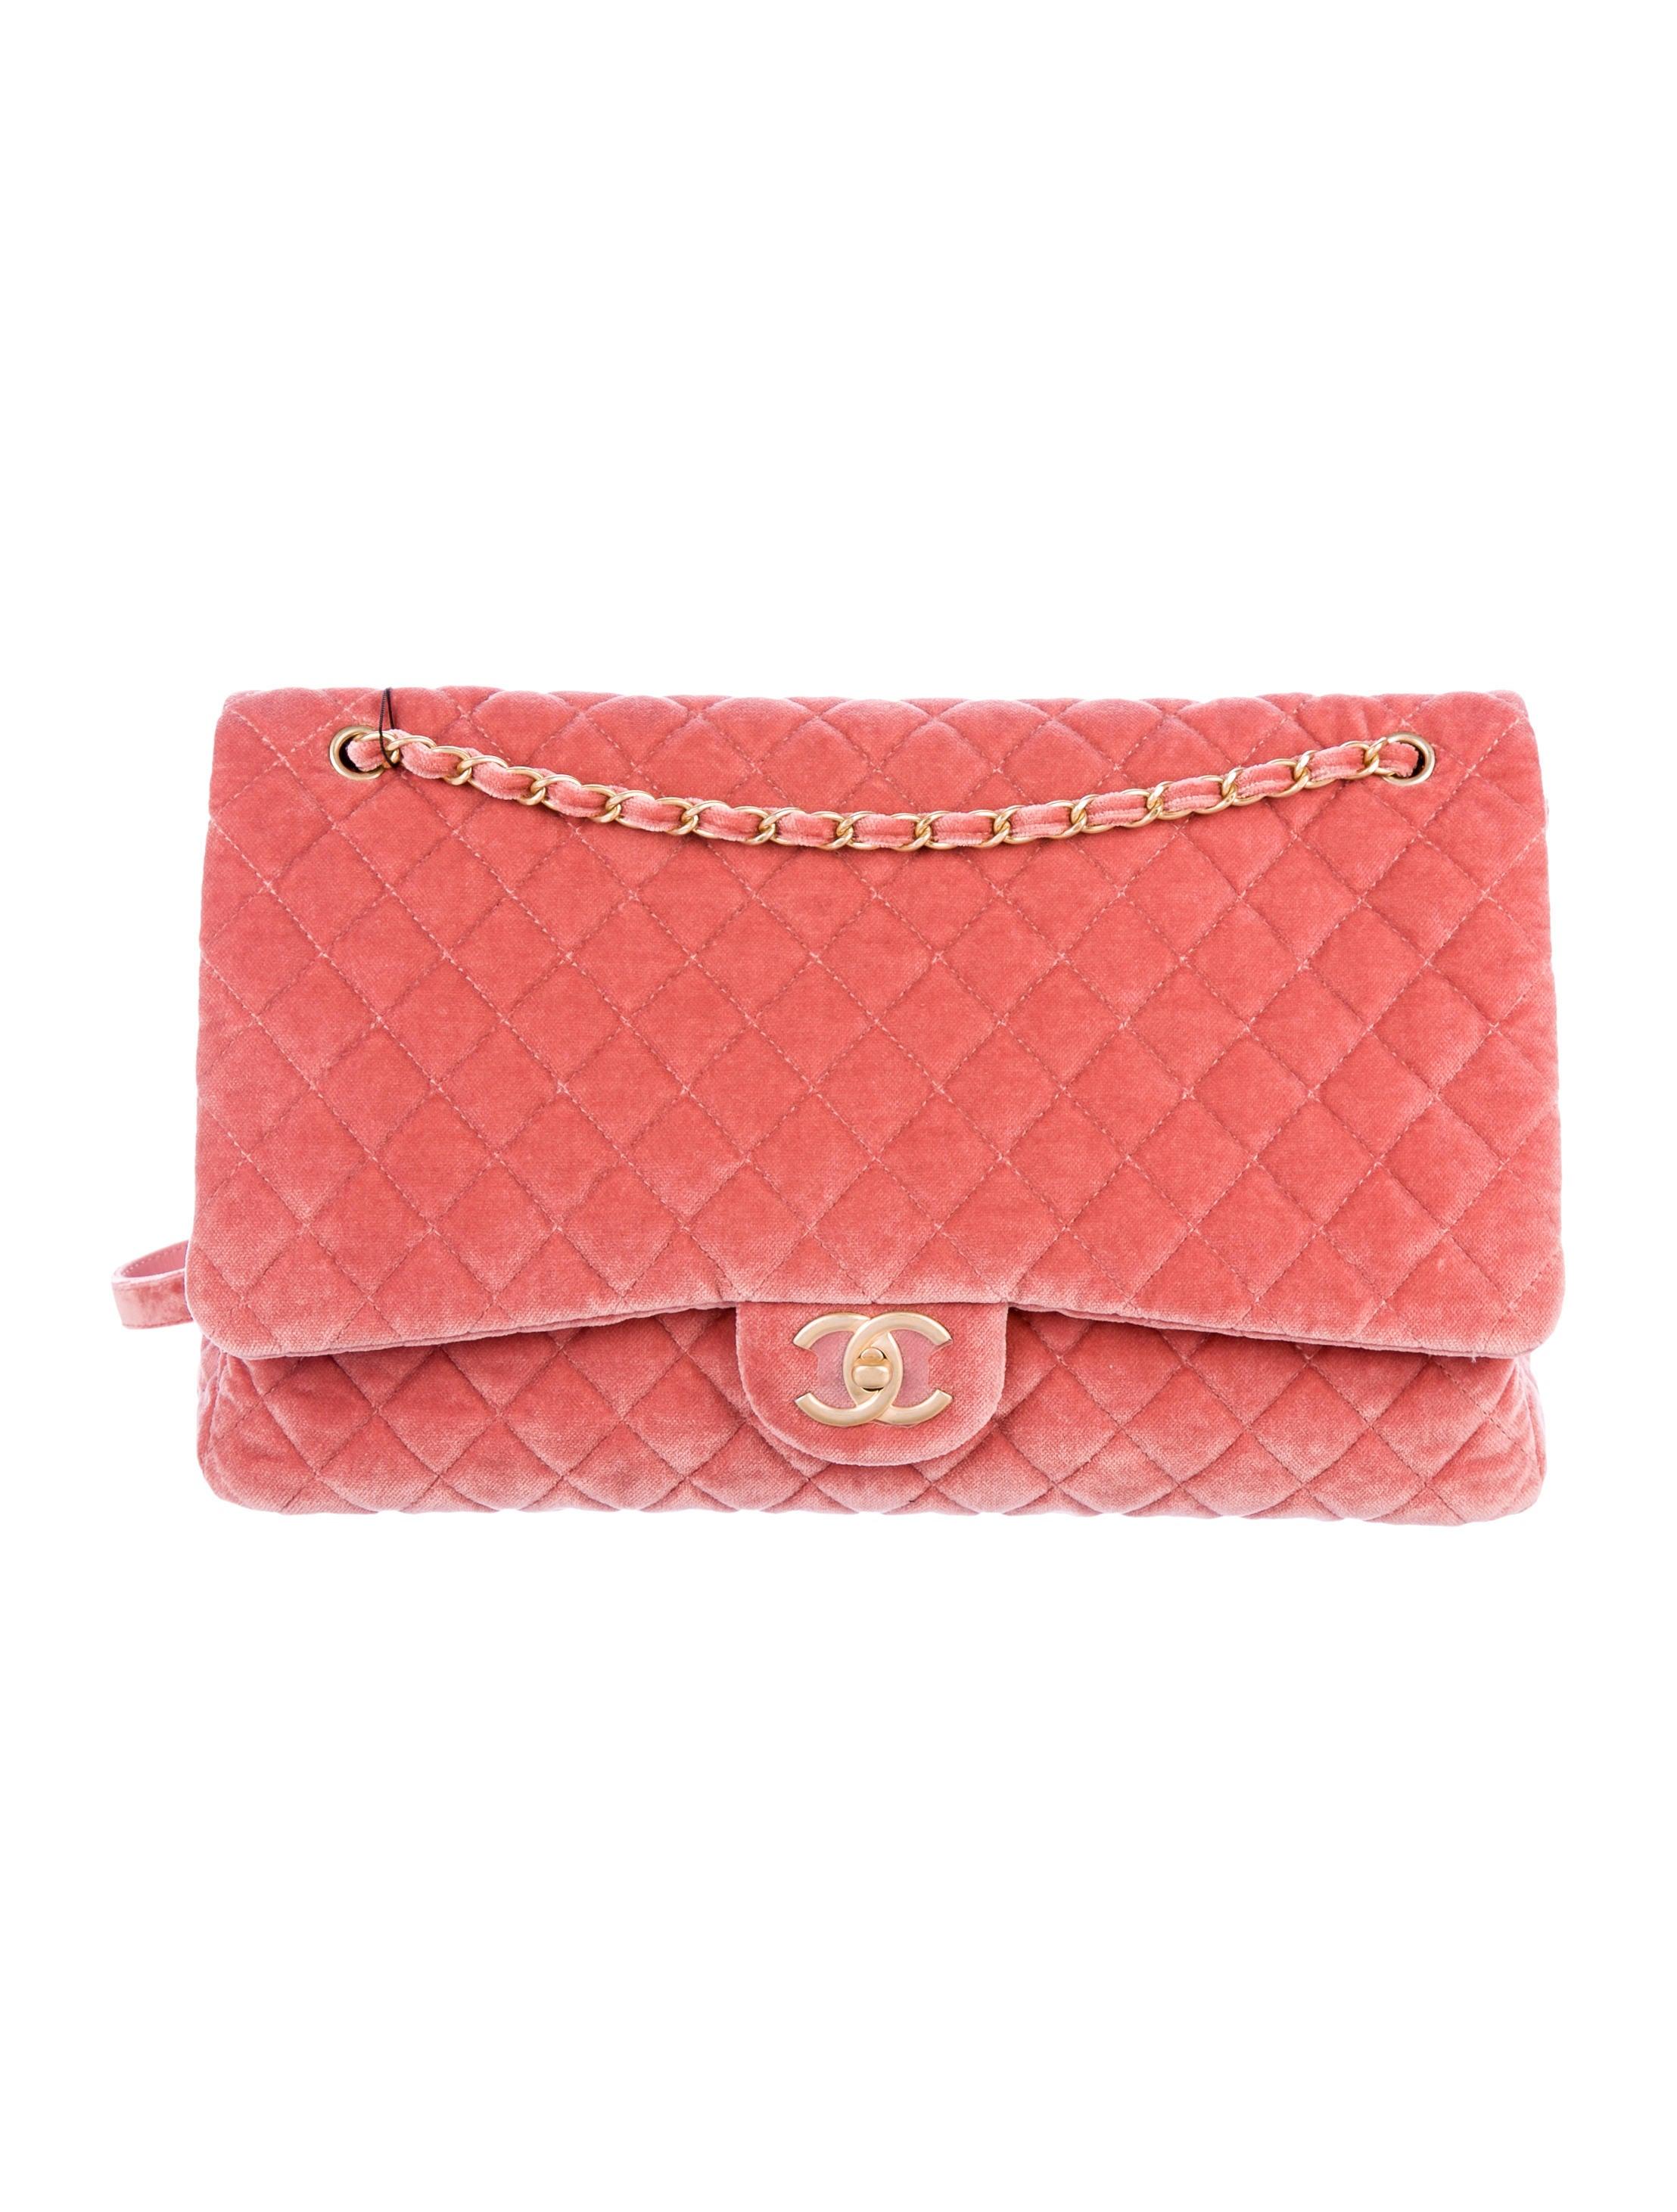 566c8e812e9a52 Chanel 2017 XXL Airline Classic Flap Bag - Handbags - CHA227000 | The  RealReal